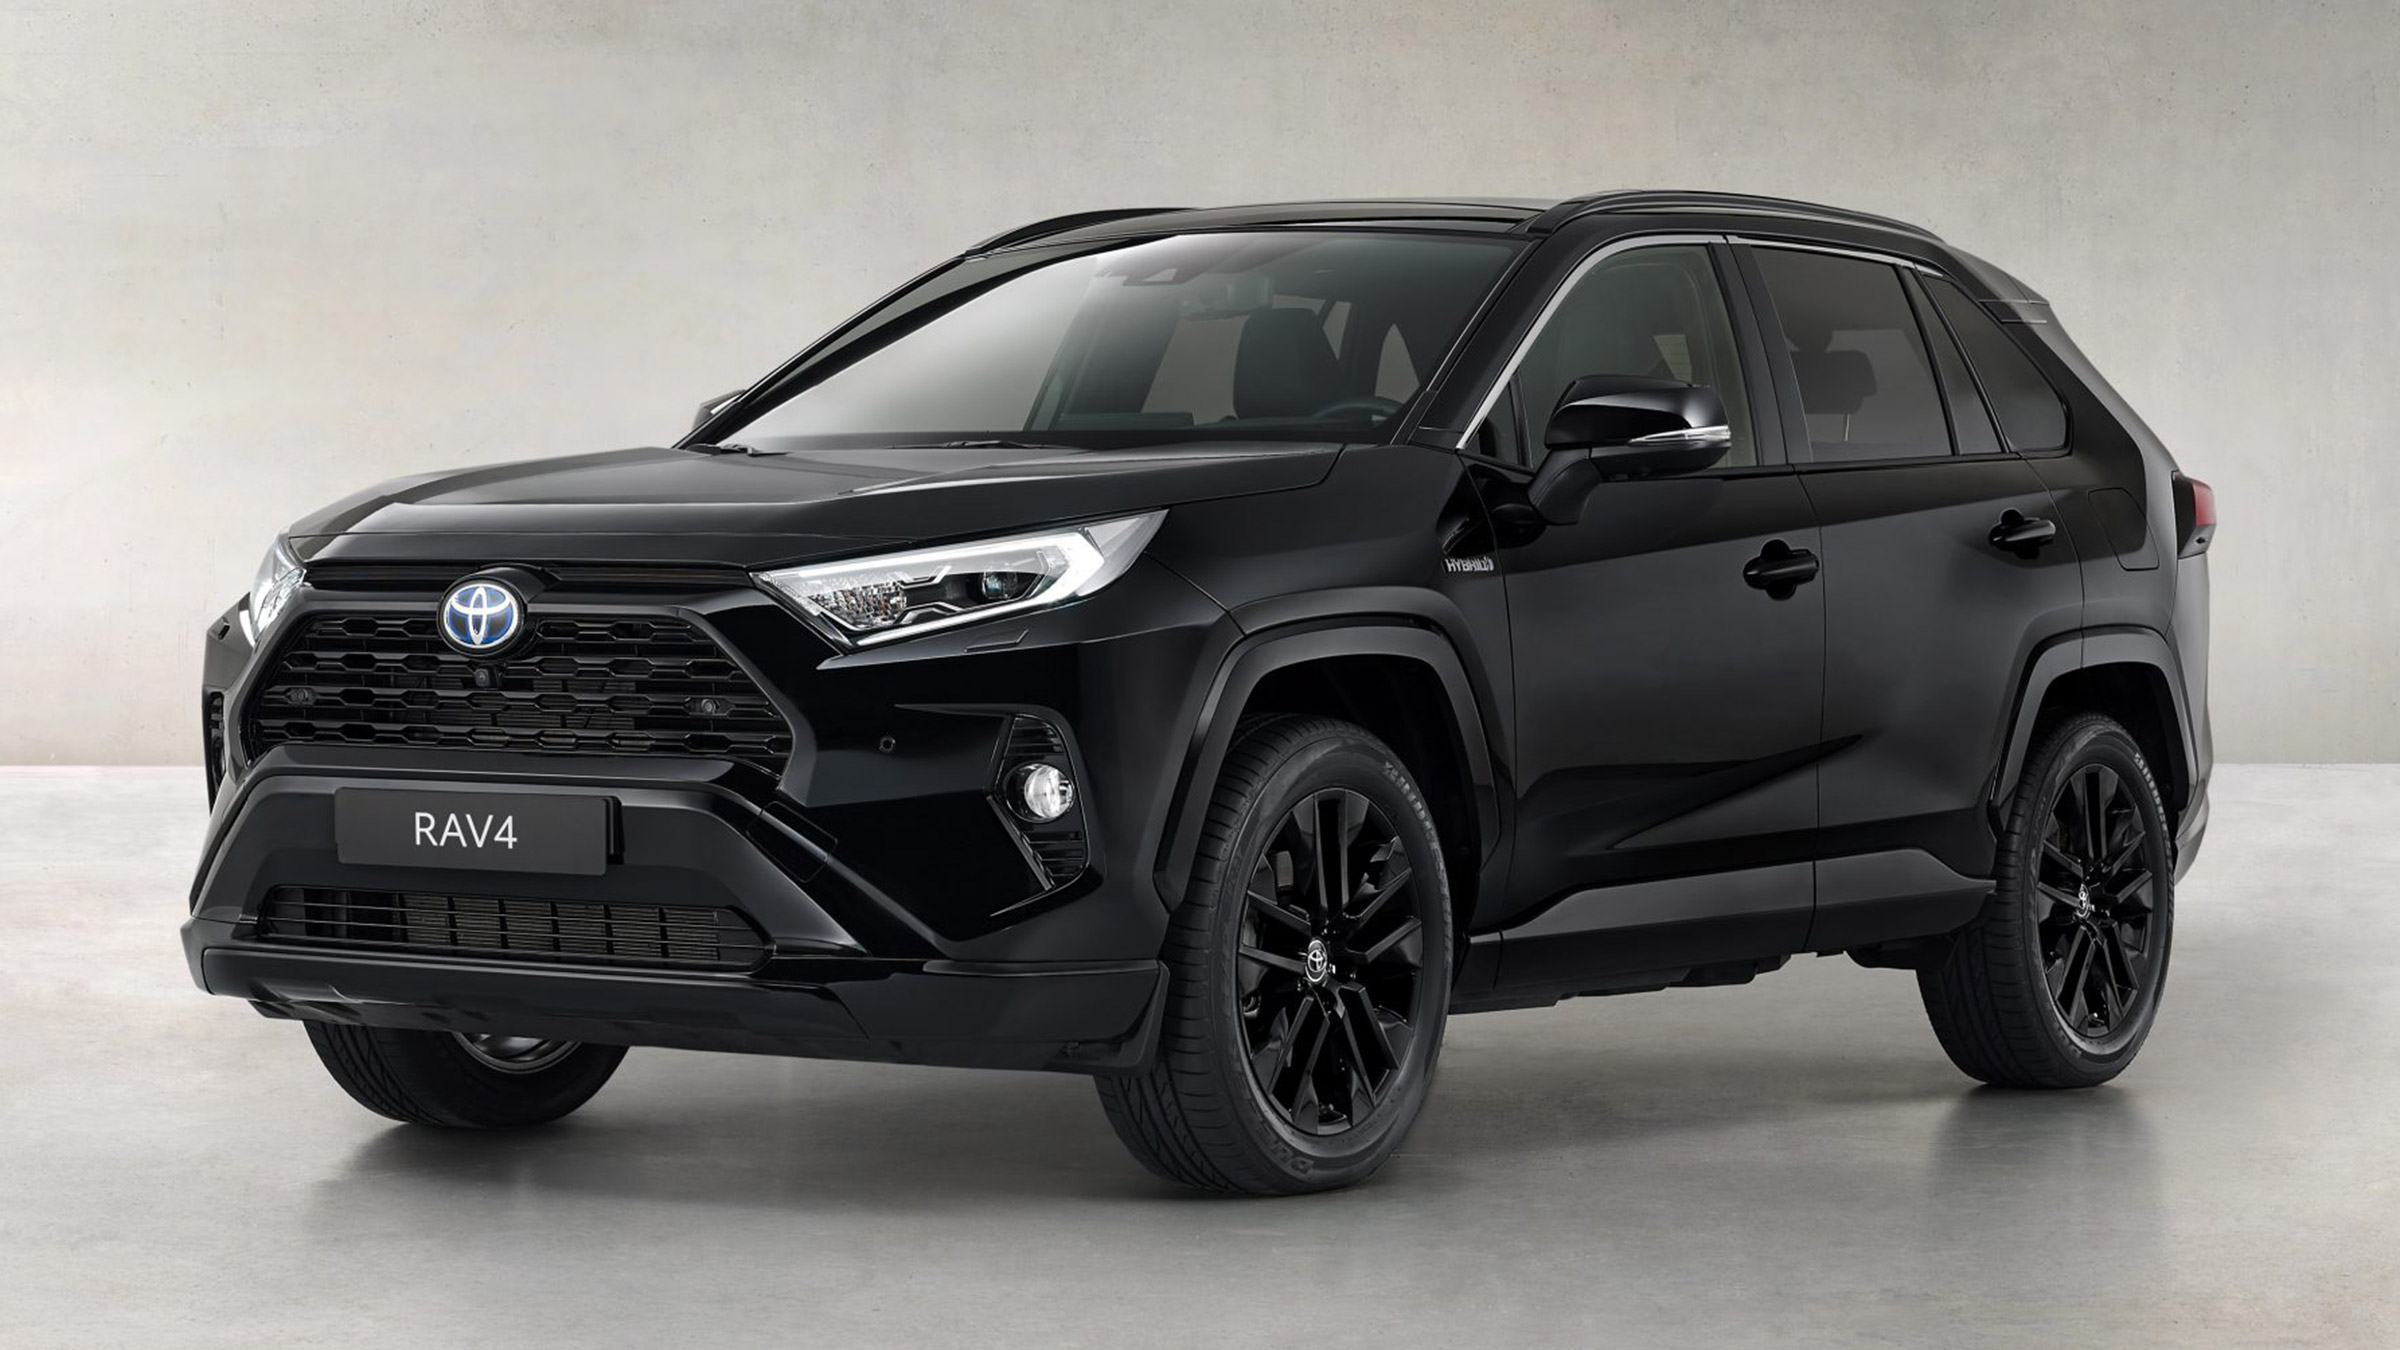 New 2020 Toyota RAV4 Black Edition added to line-up - AutoExpress